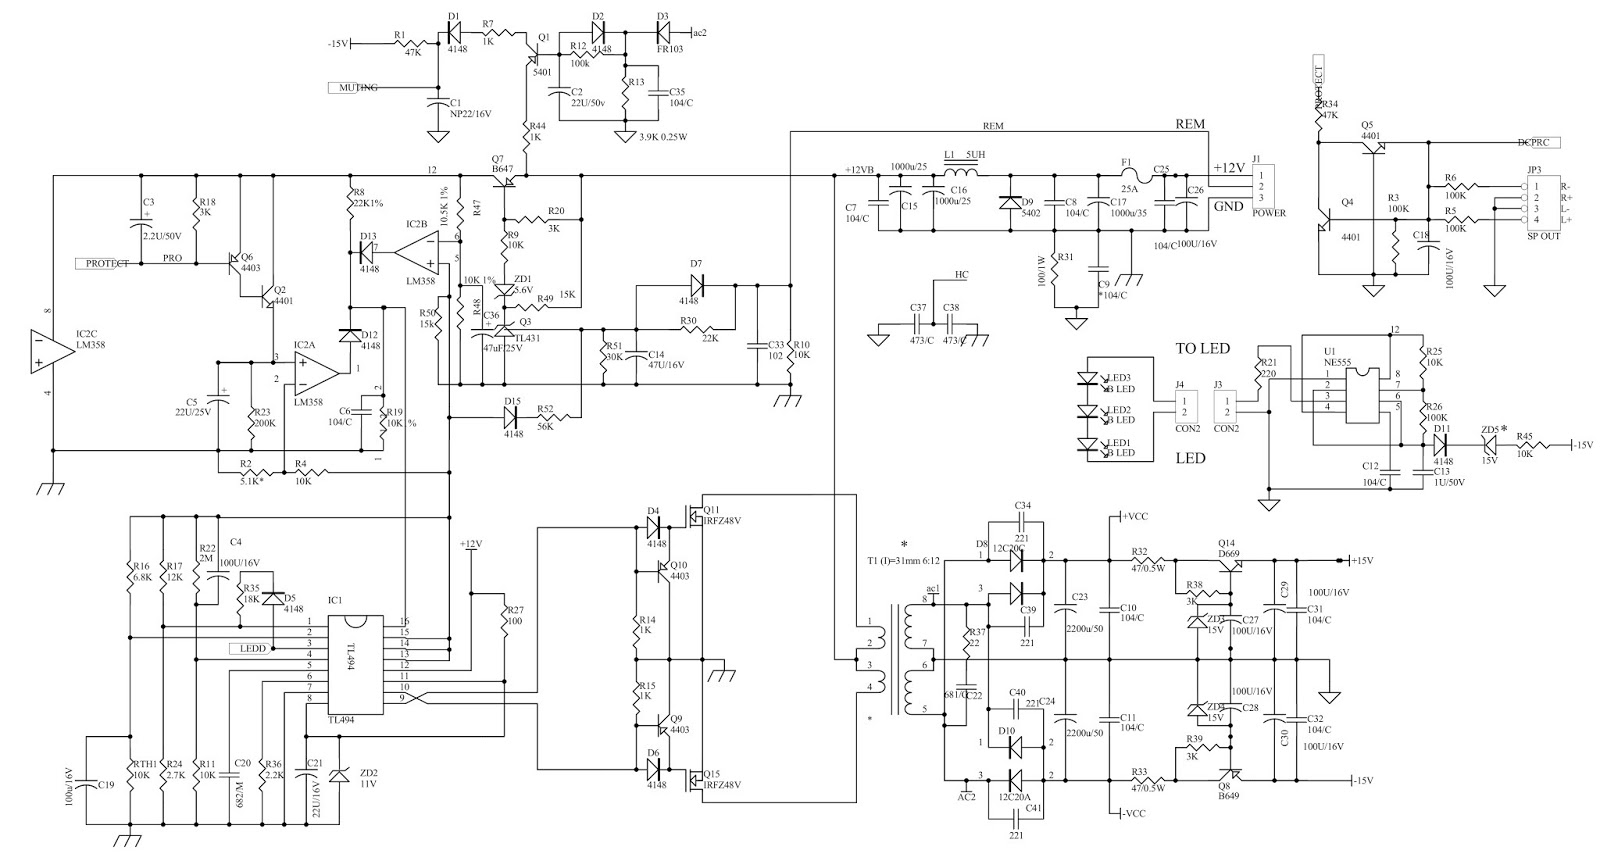 4x12 speaker cabinet wiring diagrams free download wiring diagrams kitchen cabinet diagrams plans free download unhealthy02ihp [ 1600 x 861 Pixel ]